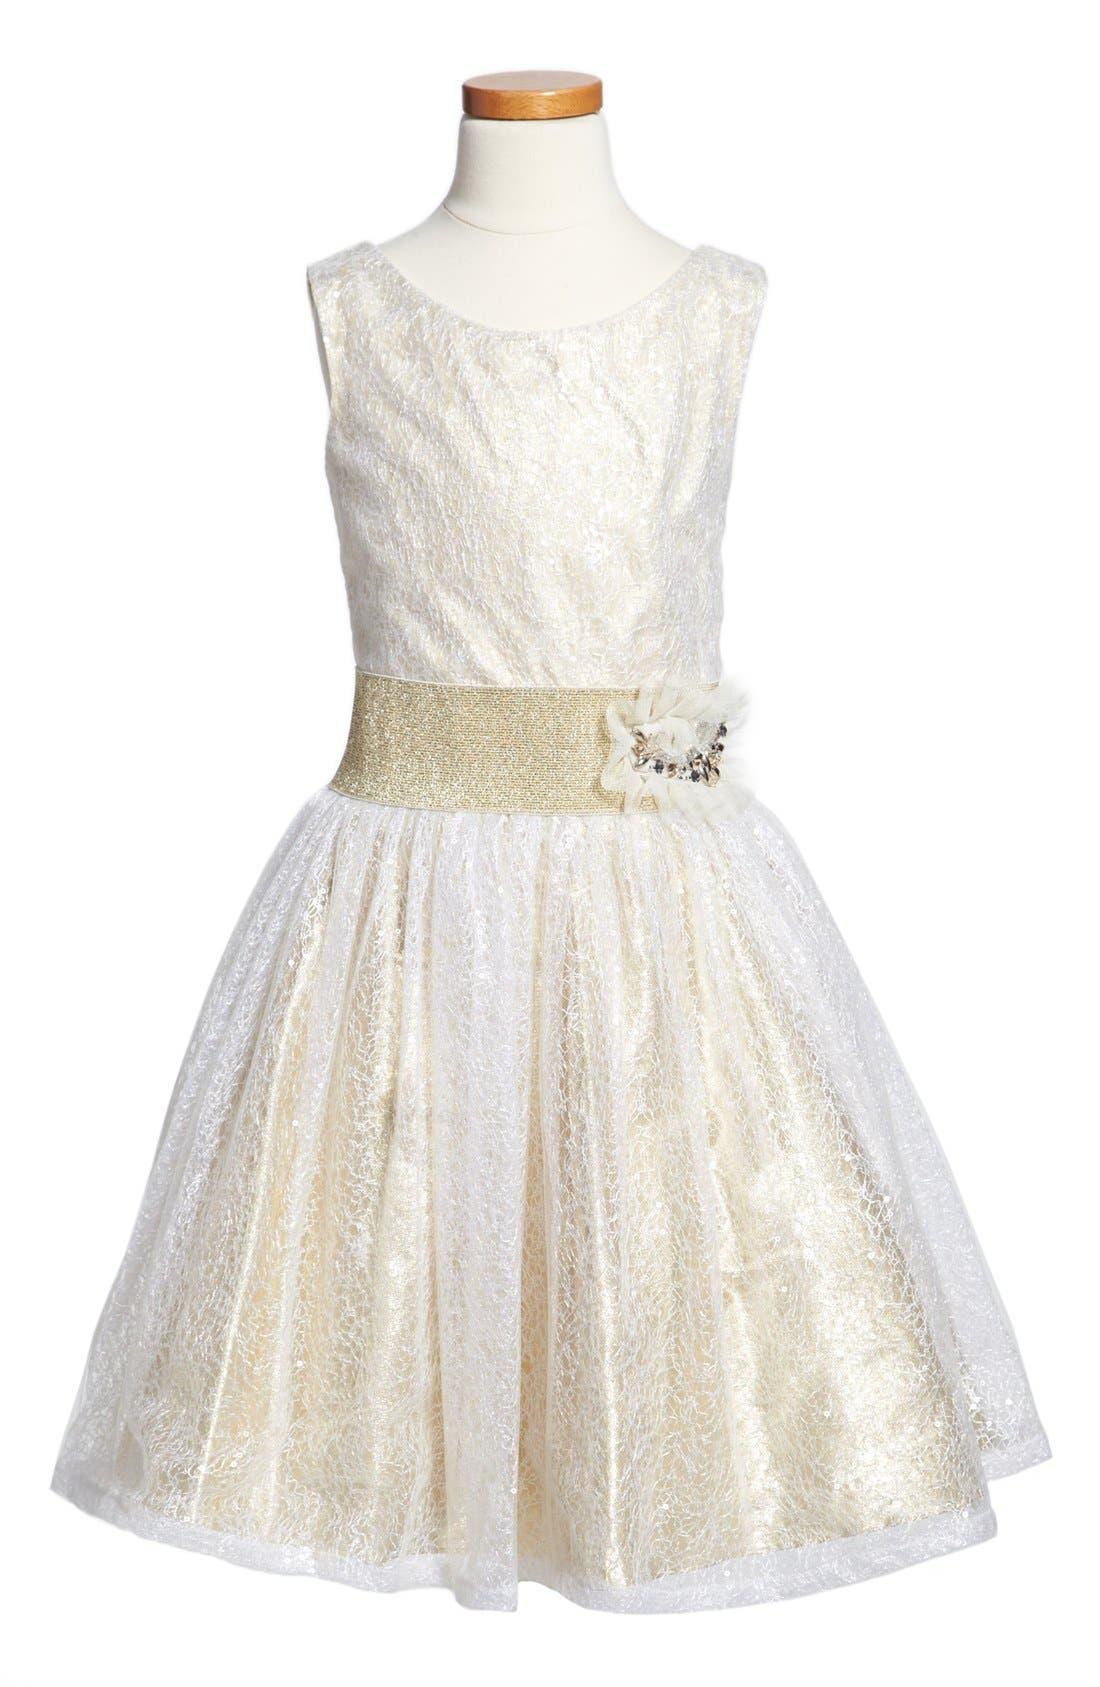 Main Image - Zoe Ltd Sleeveless Dress (Big Girls)